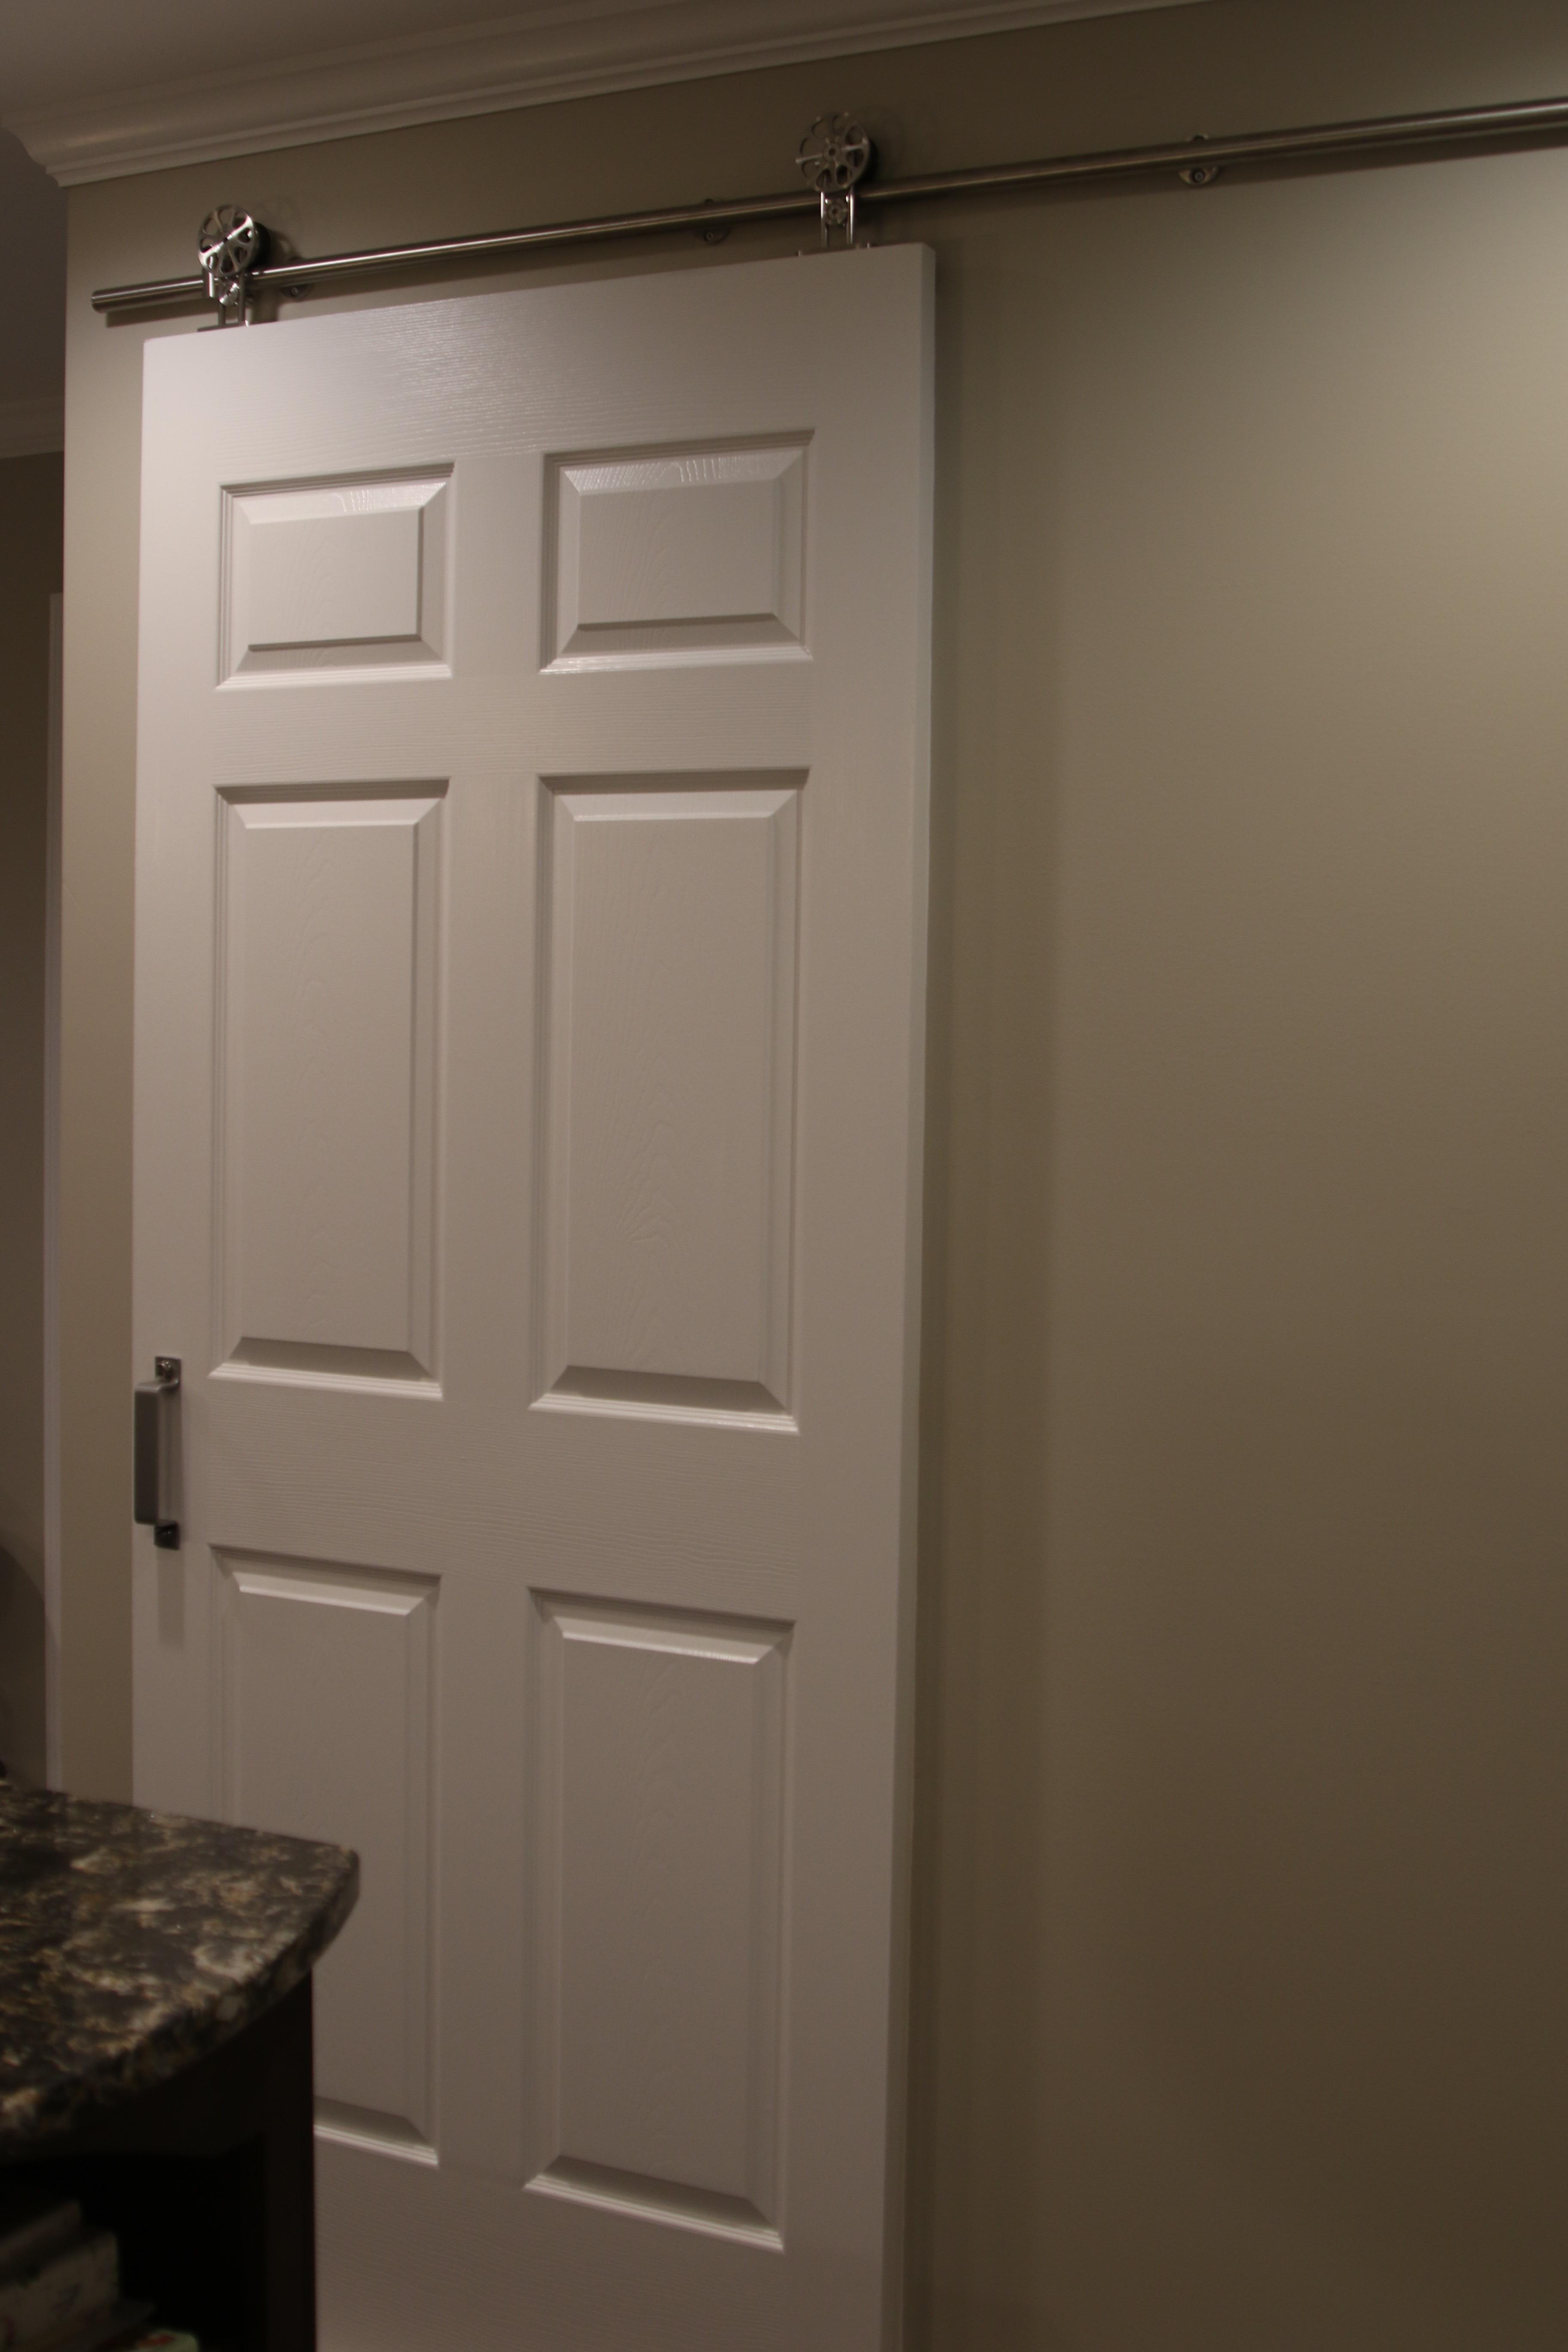 Barn Doors04-squashed